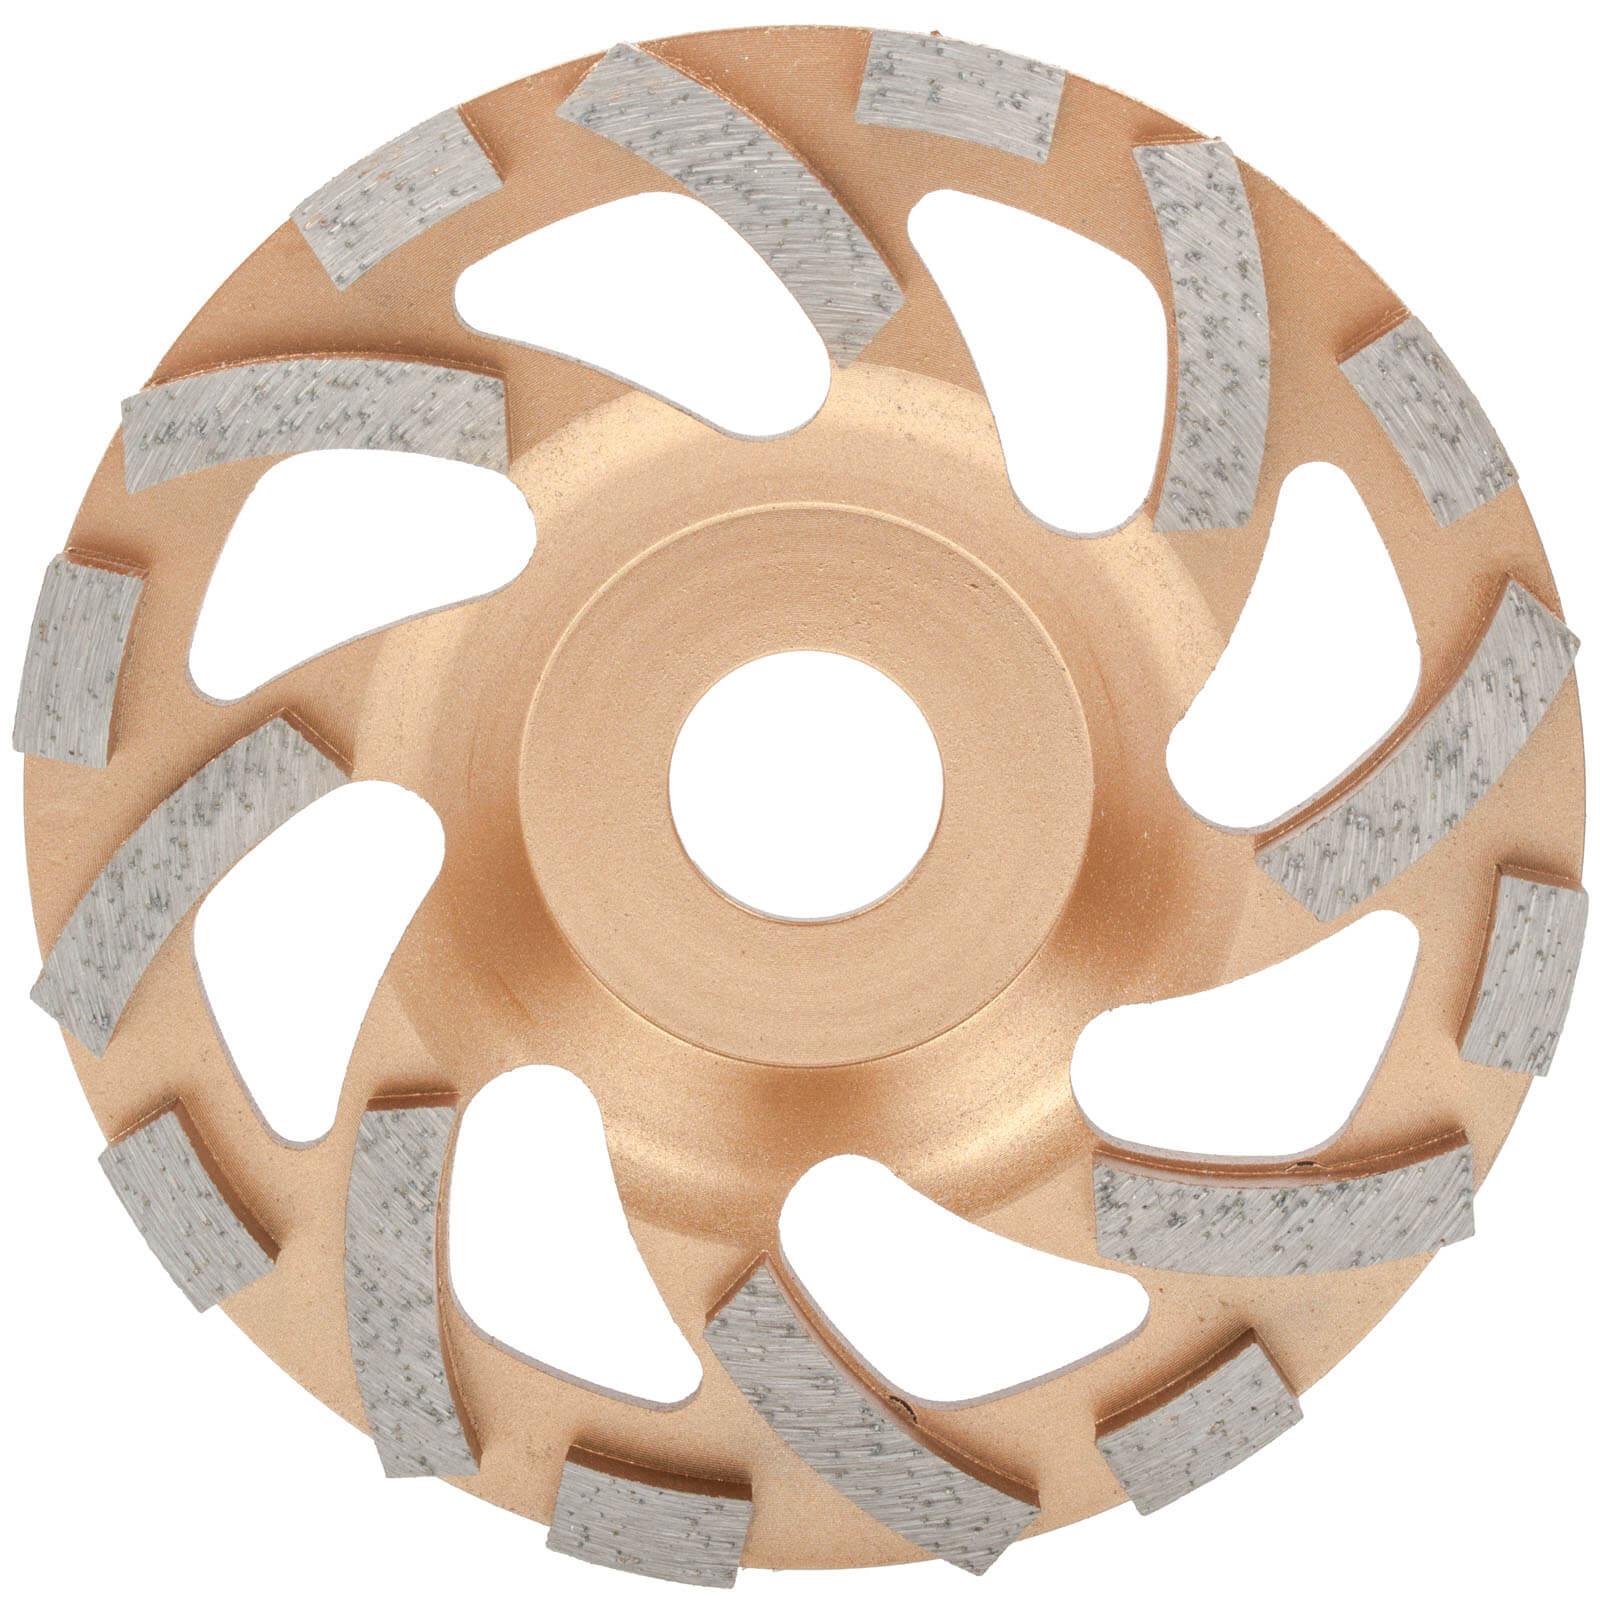 diamant schleifteller 125 fliesenkleber entfernen estrich beton schleiftopf ebay. Black Bedroom Furniture Sets. Home Design Ideas